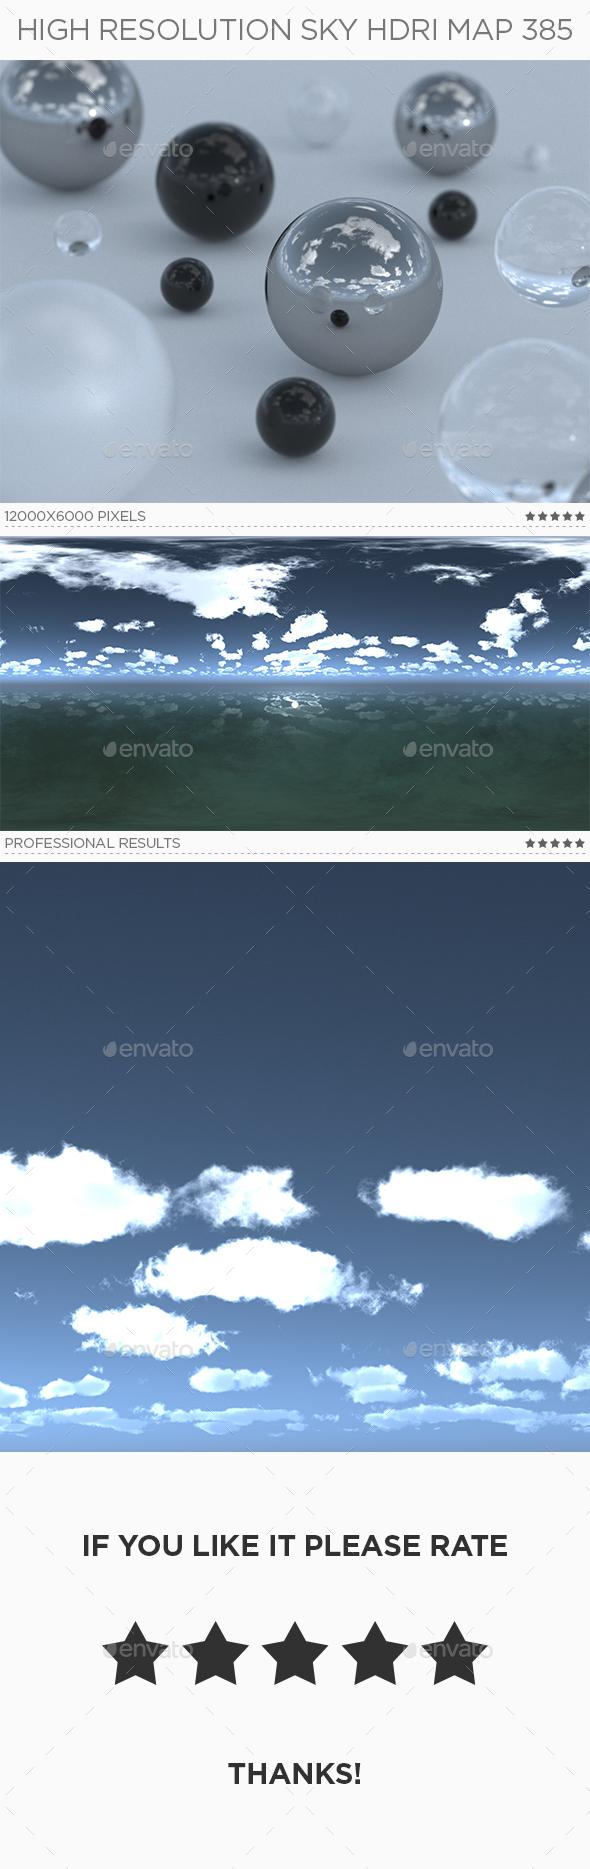 High Resolution Sky HDRi Map 385 - 3DOcean Item for Sale